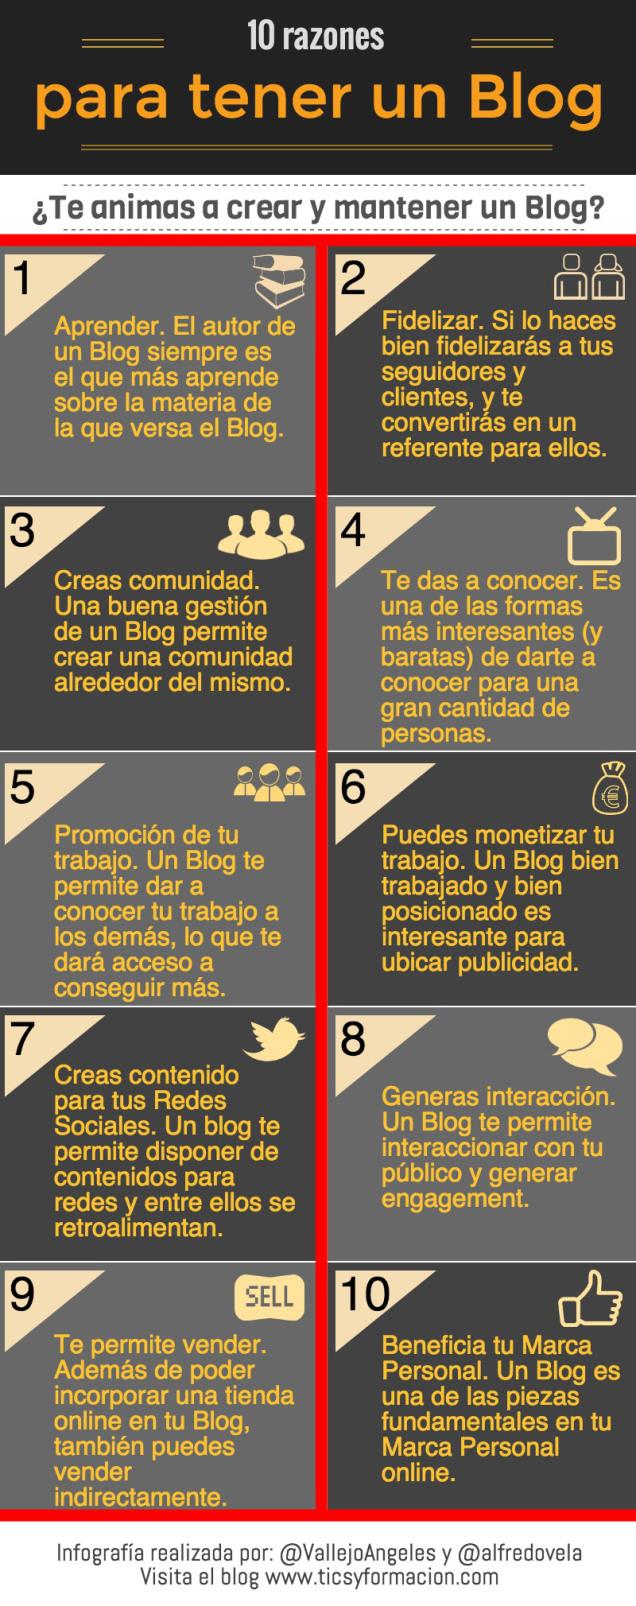 10-razones-para-tener-un-Blog-infografia